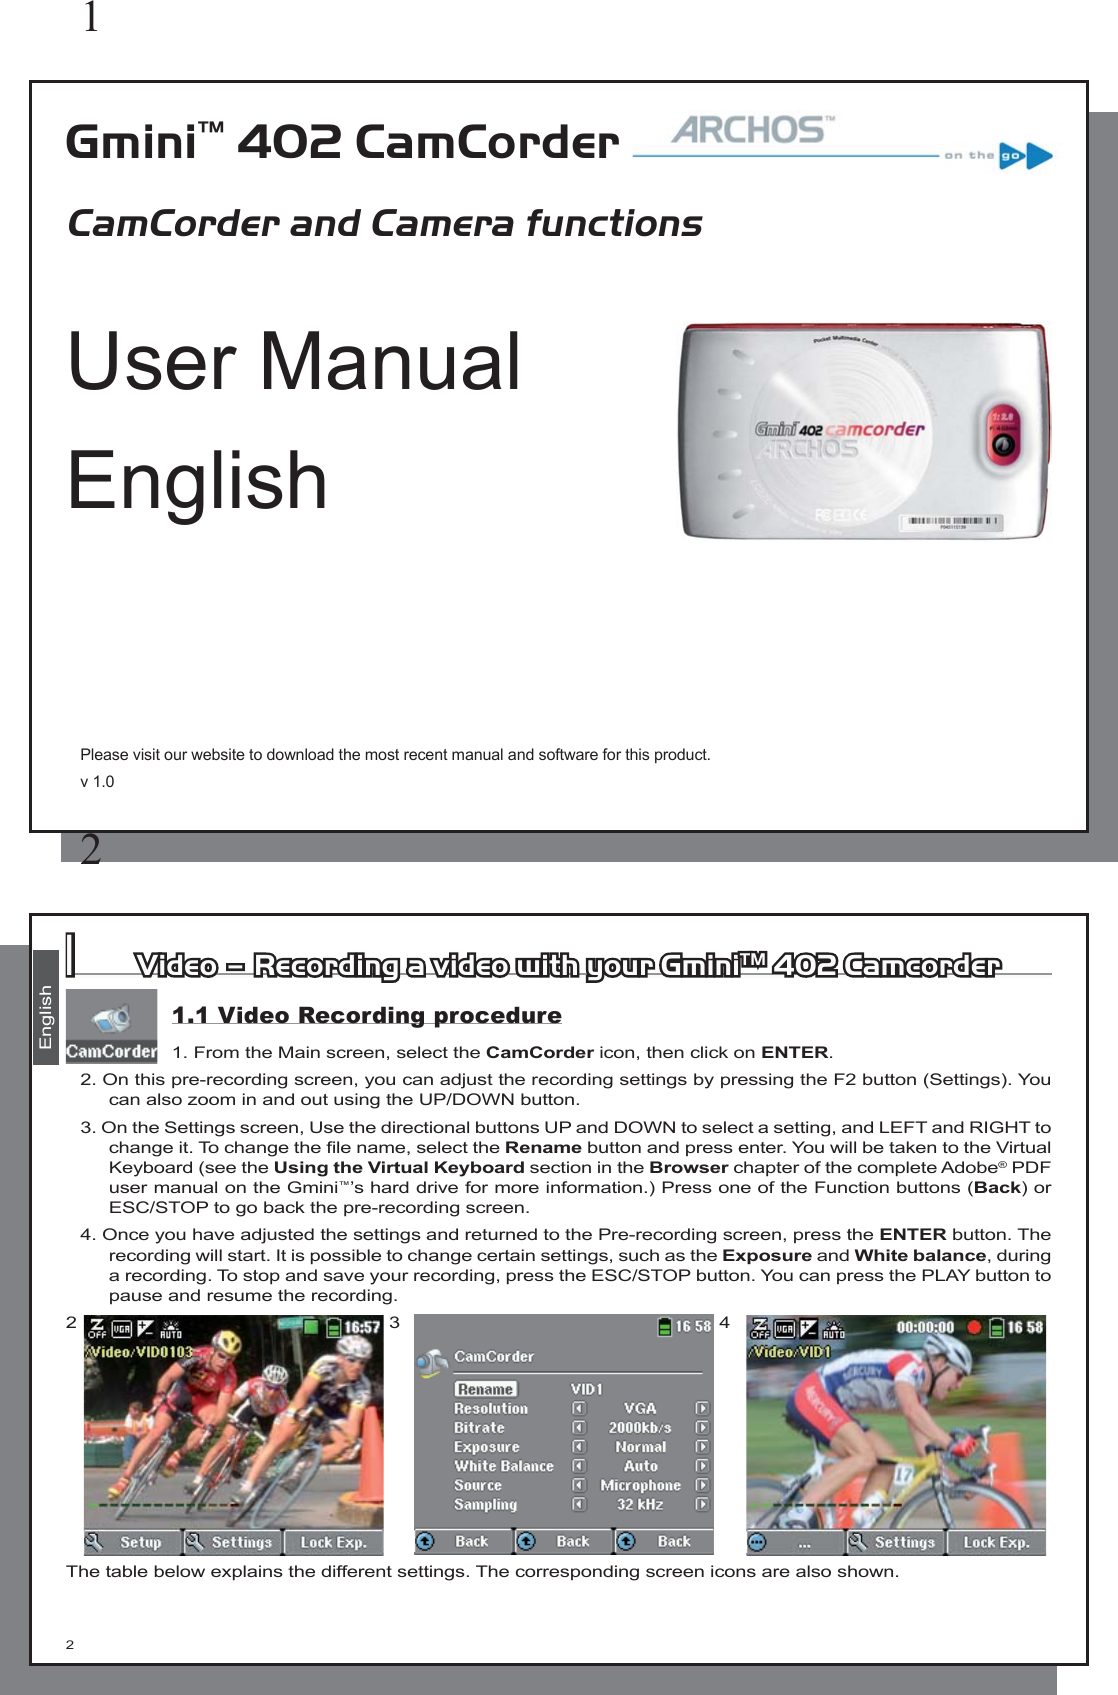 archos gmini 402 camcorder users manual en manual hd v10 indb rh usermanual wiki Washing Machine Manual Camcorder Remote Control